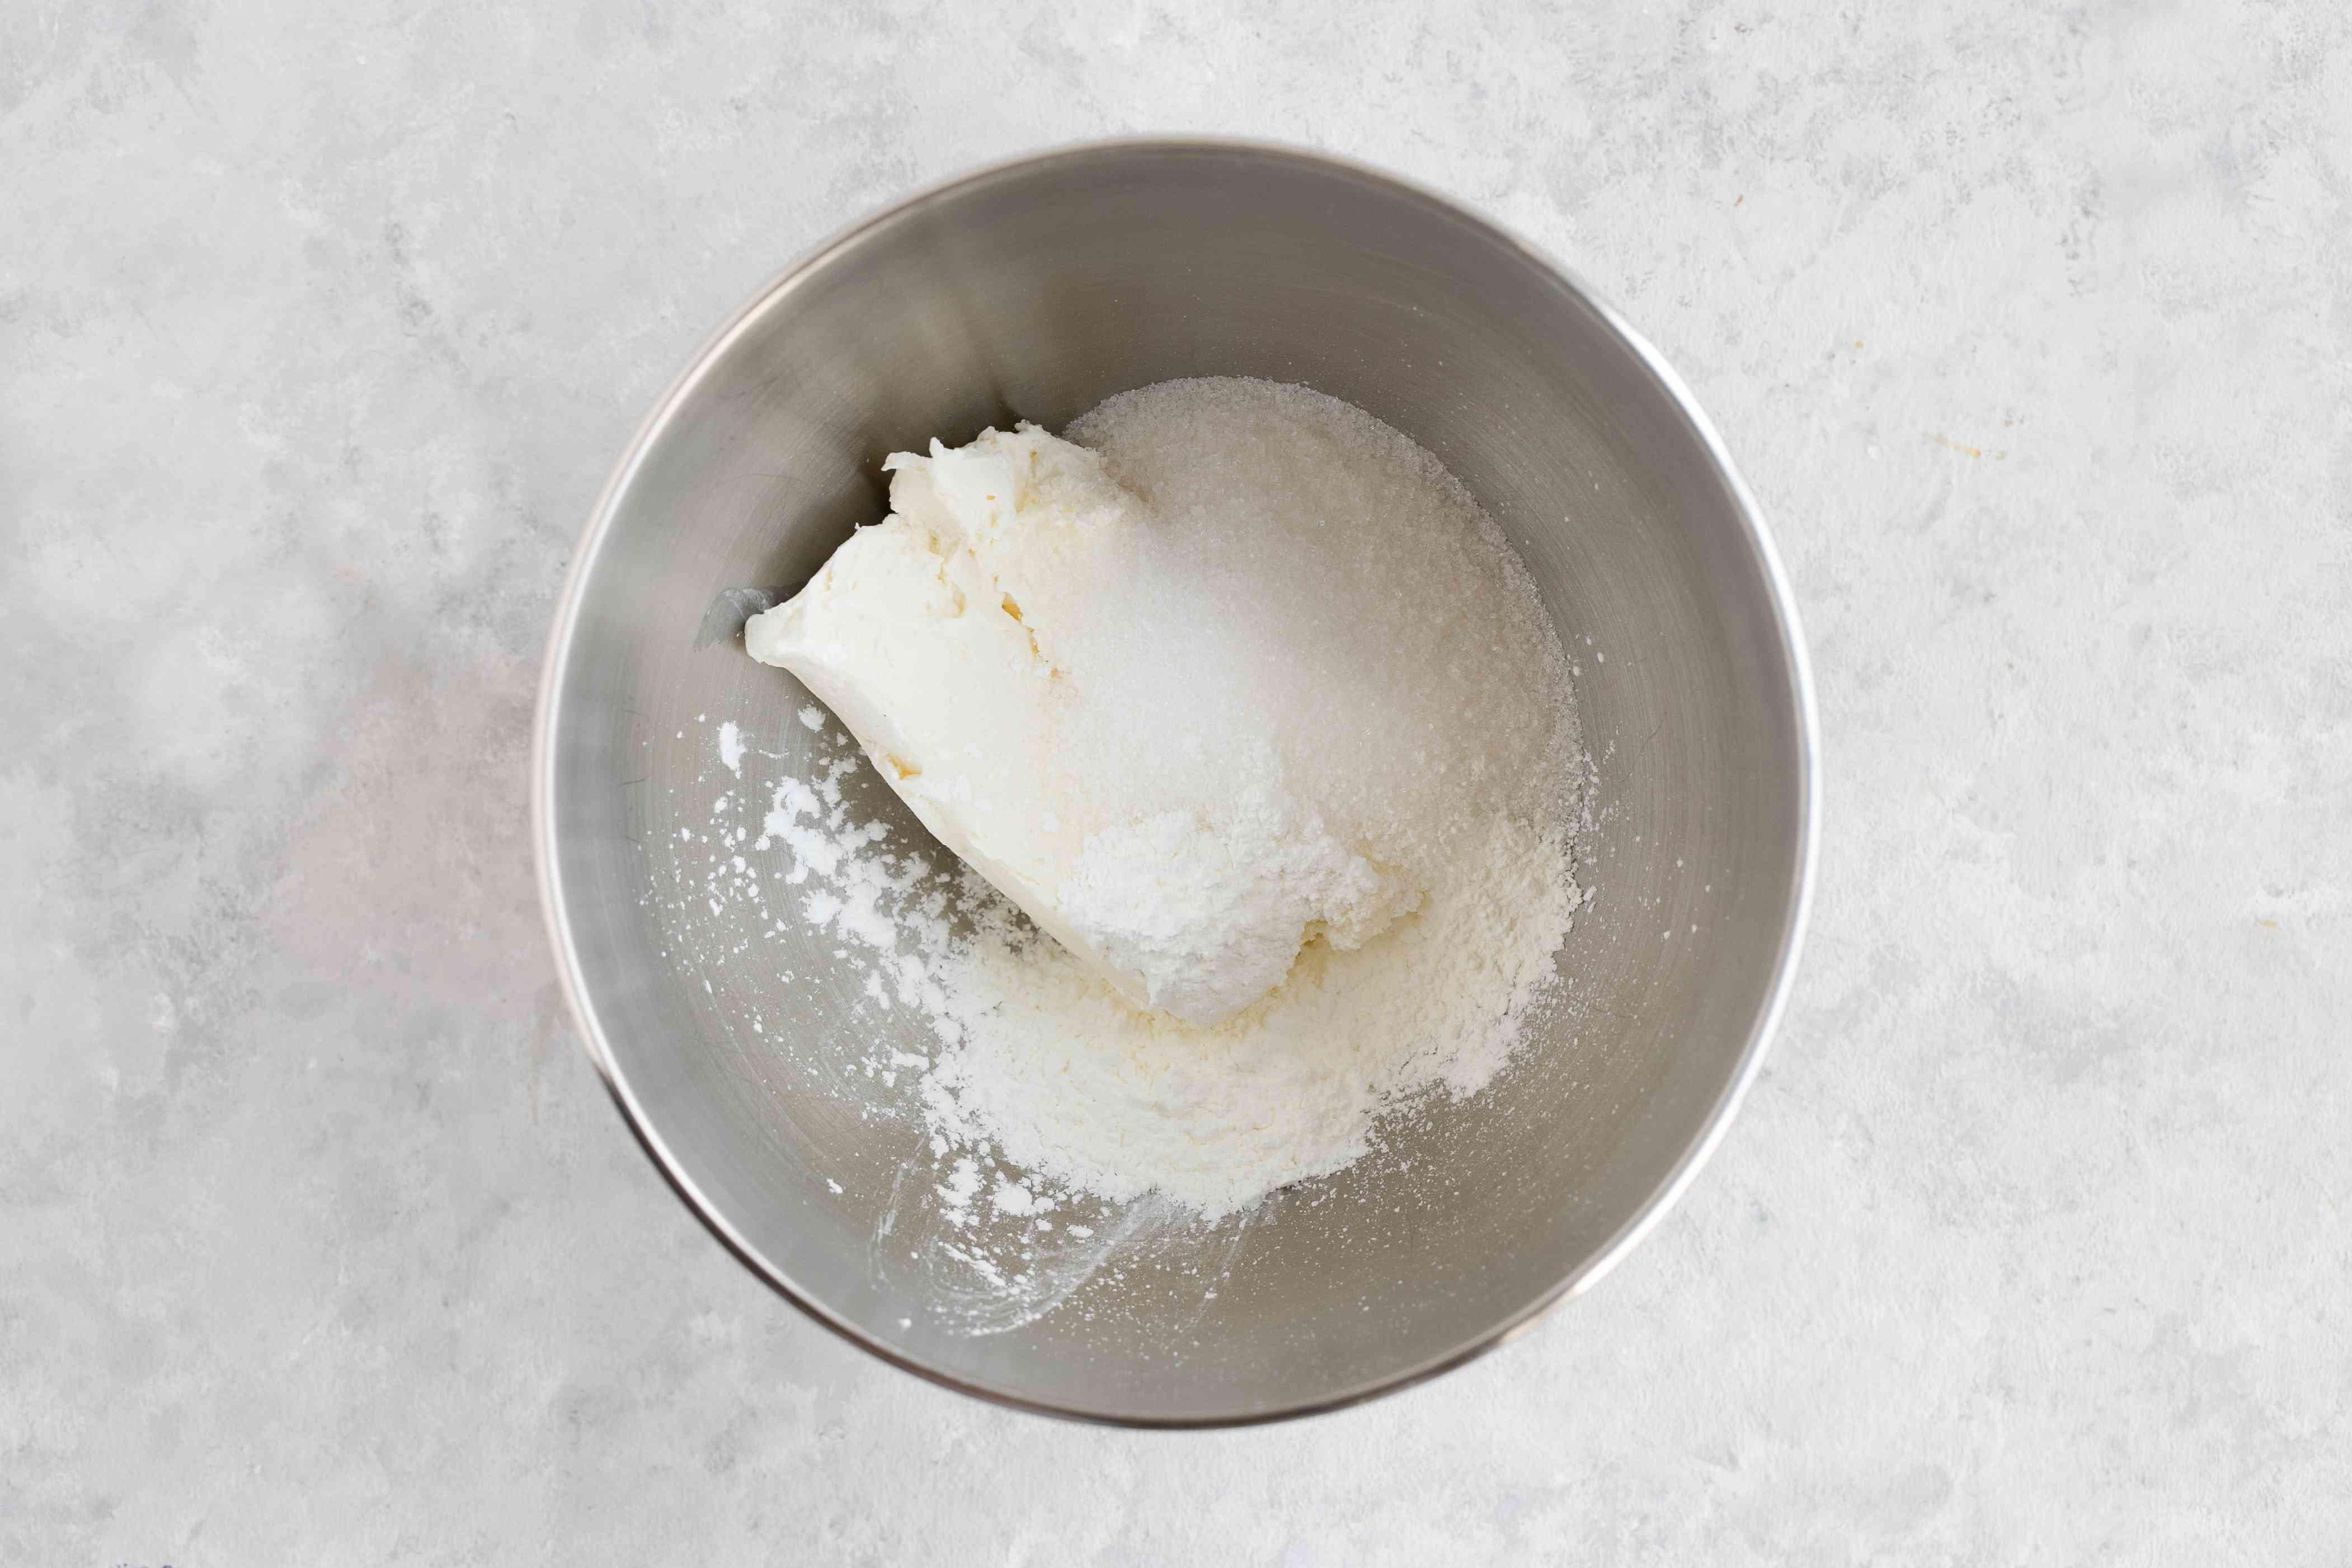 Softened cream cheese, sugar, and cornstarch